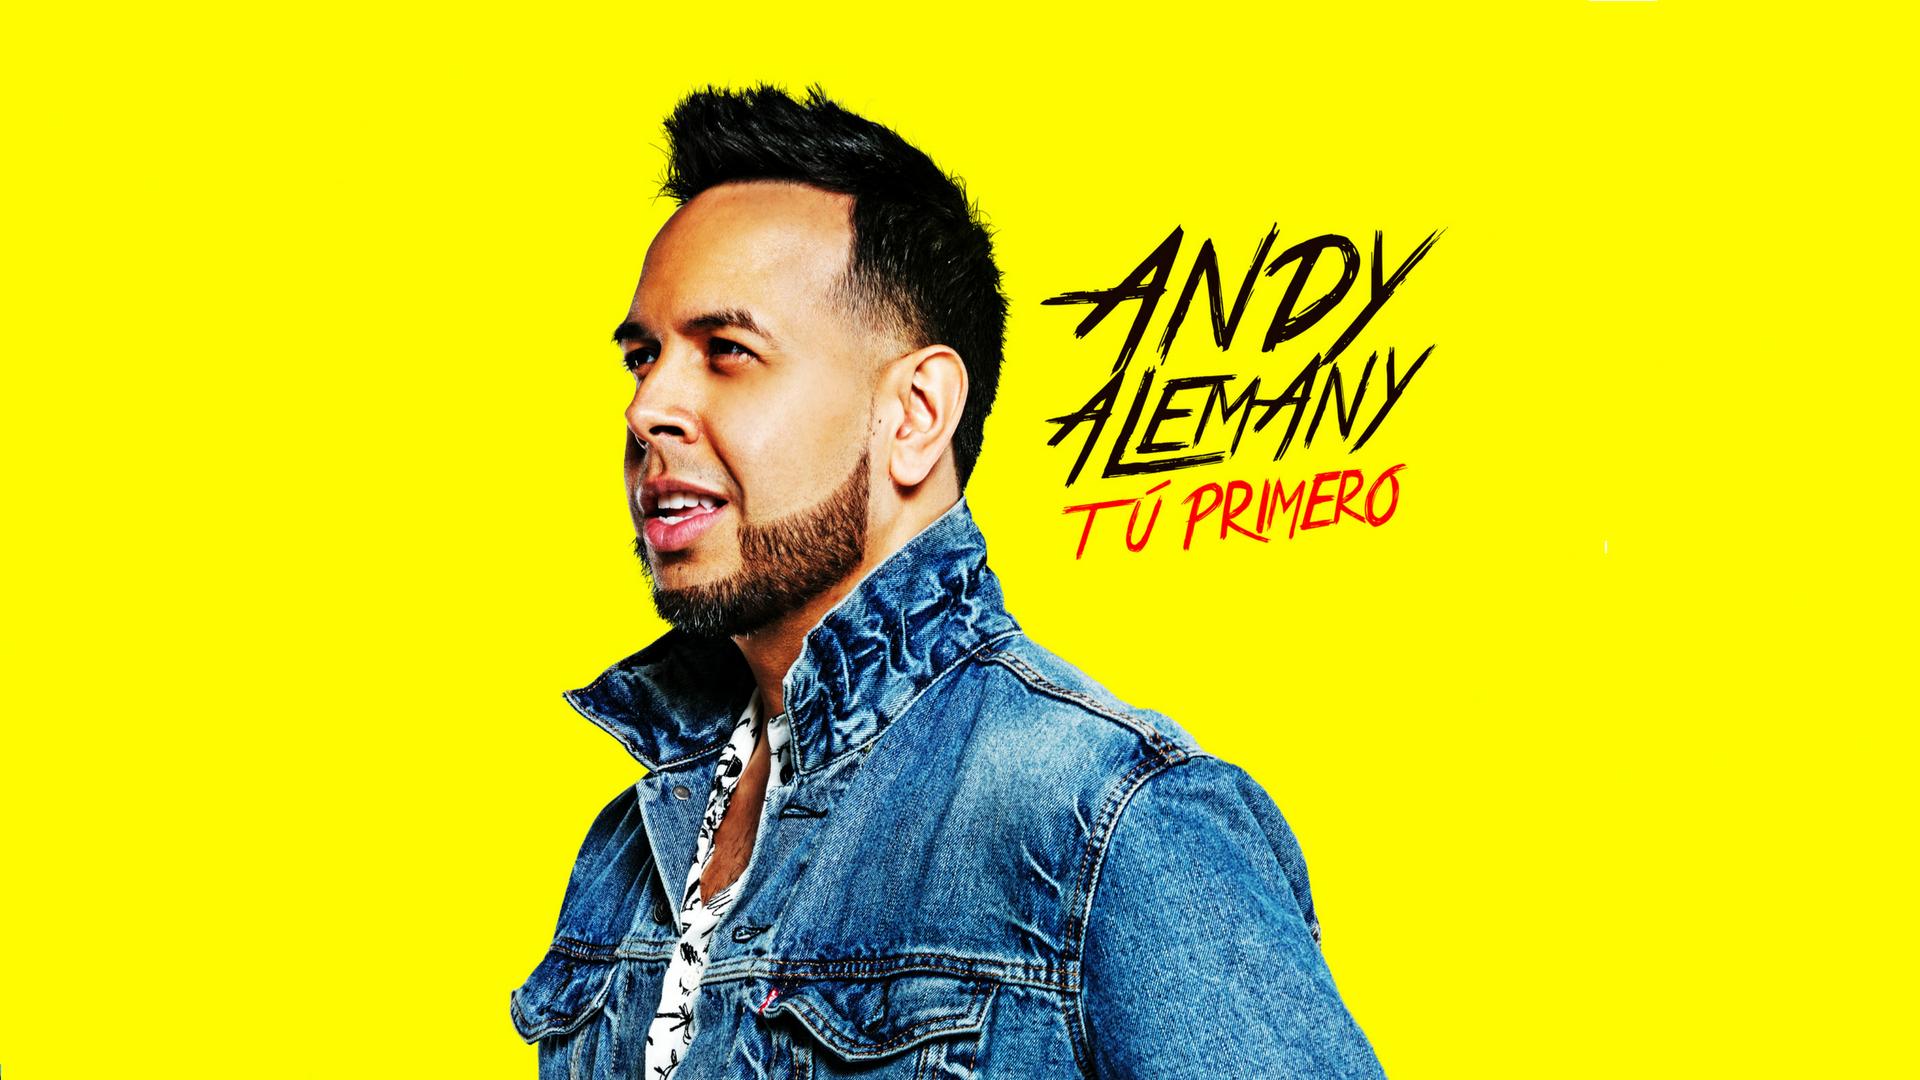 Andy Alemany (Reprodução Internet)